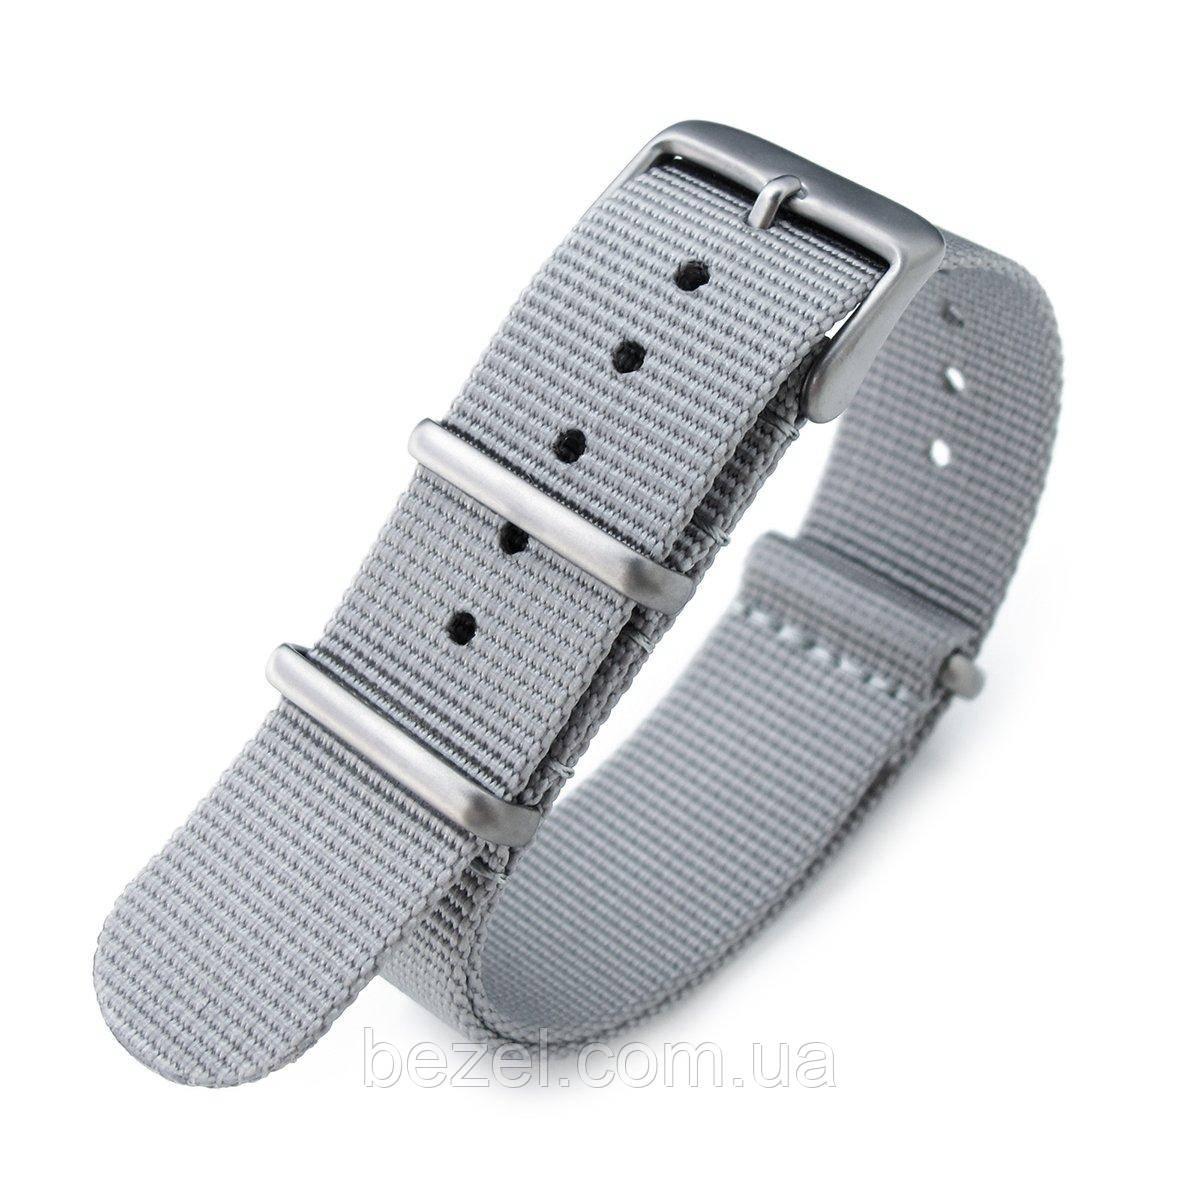 NATO 20mm G10 Military Watch Band Nylon Strap, Military Grey, Sandblasted, 260mm